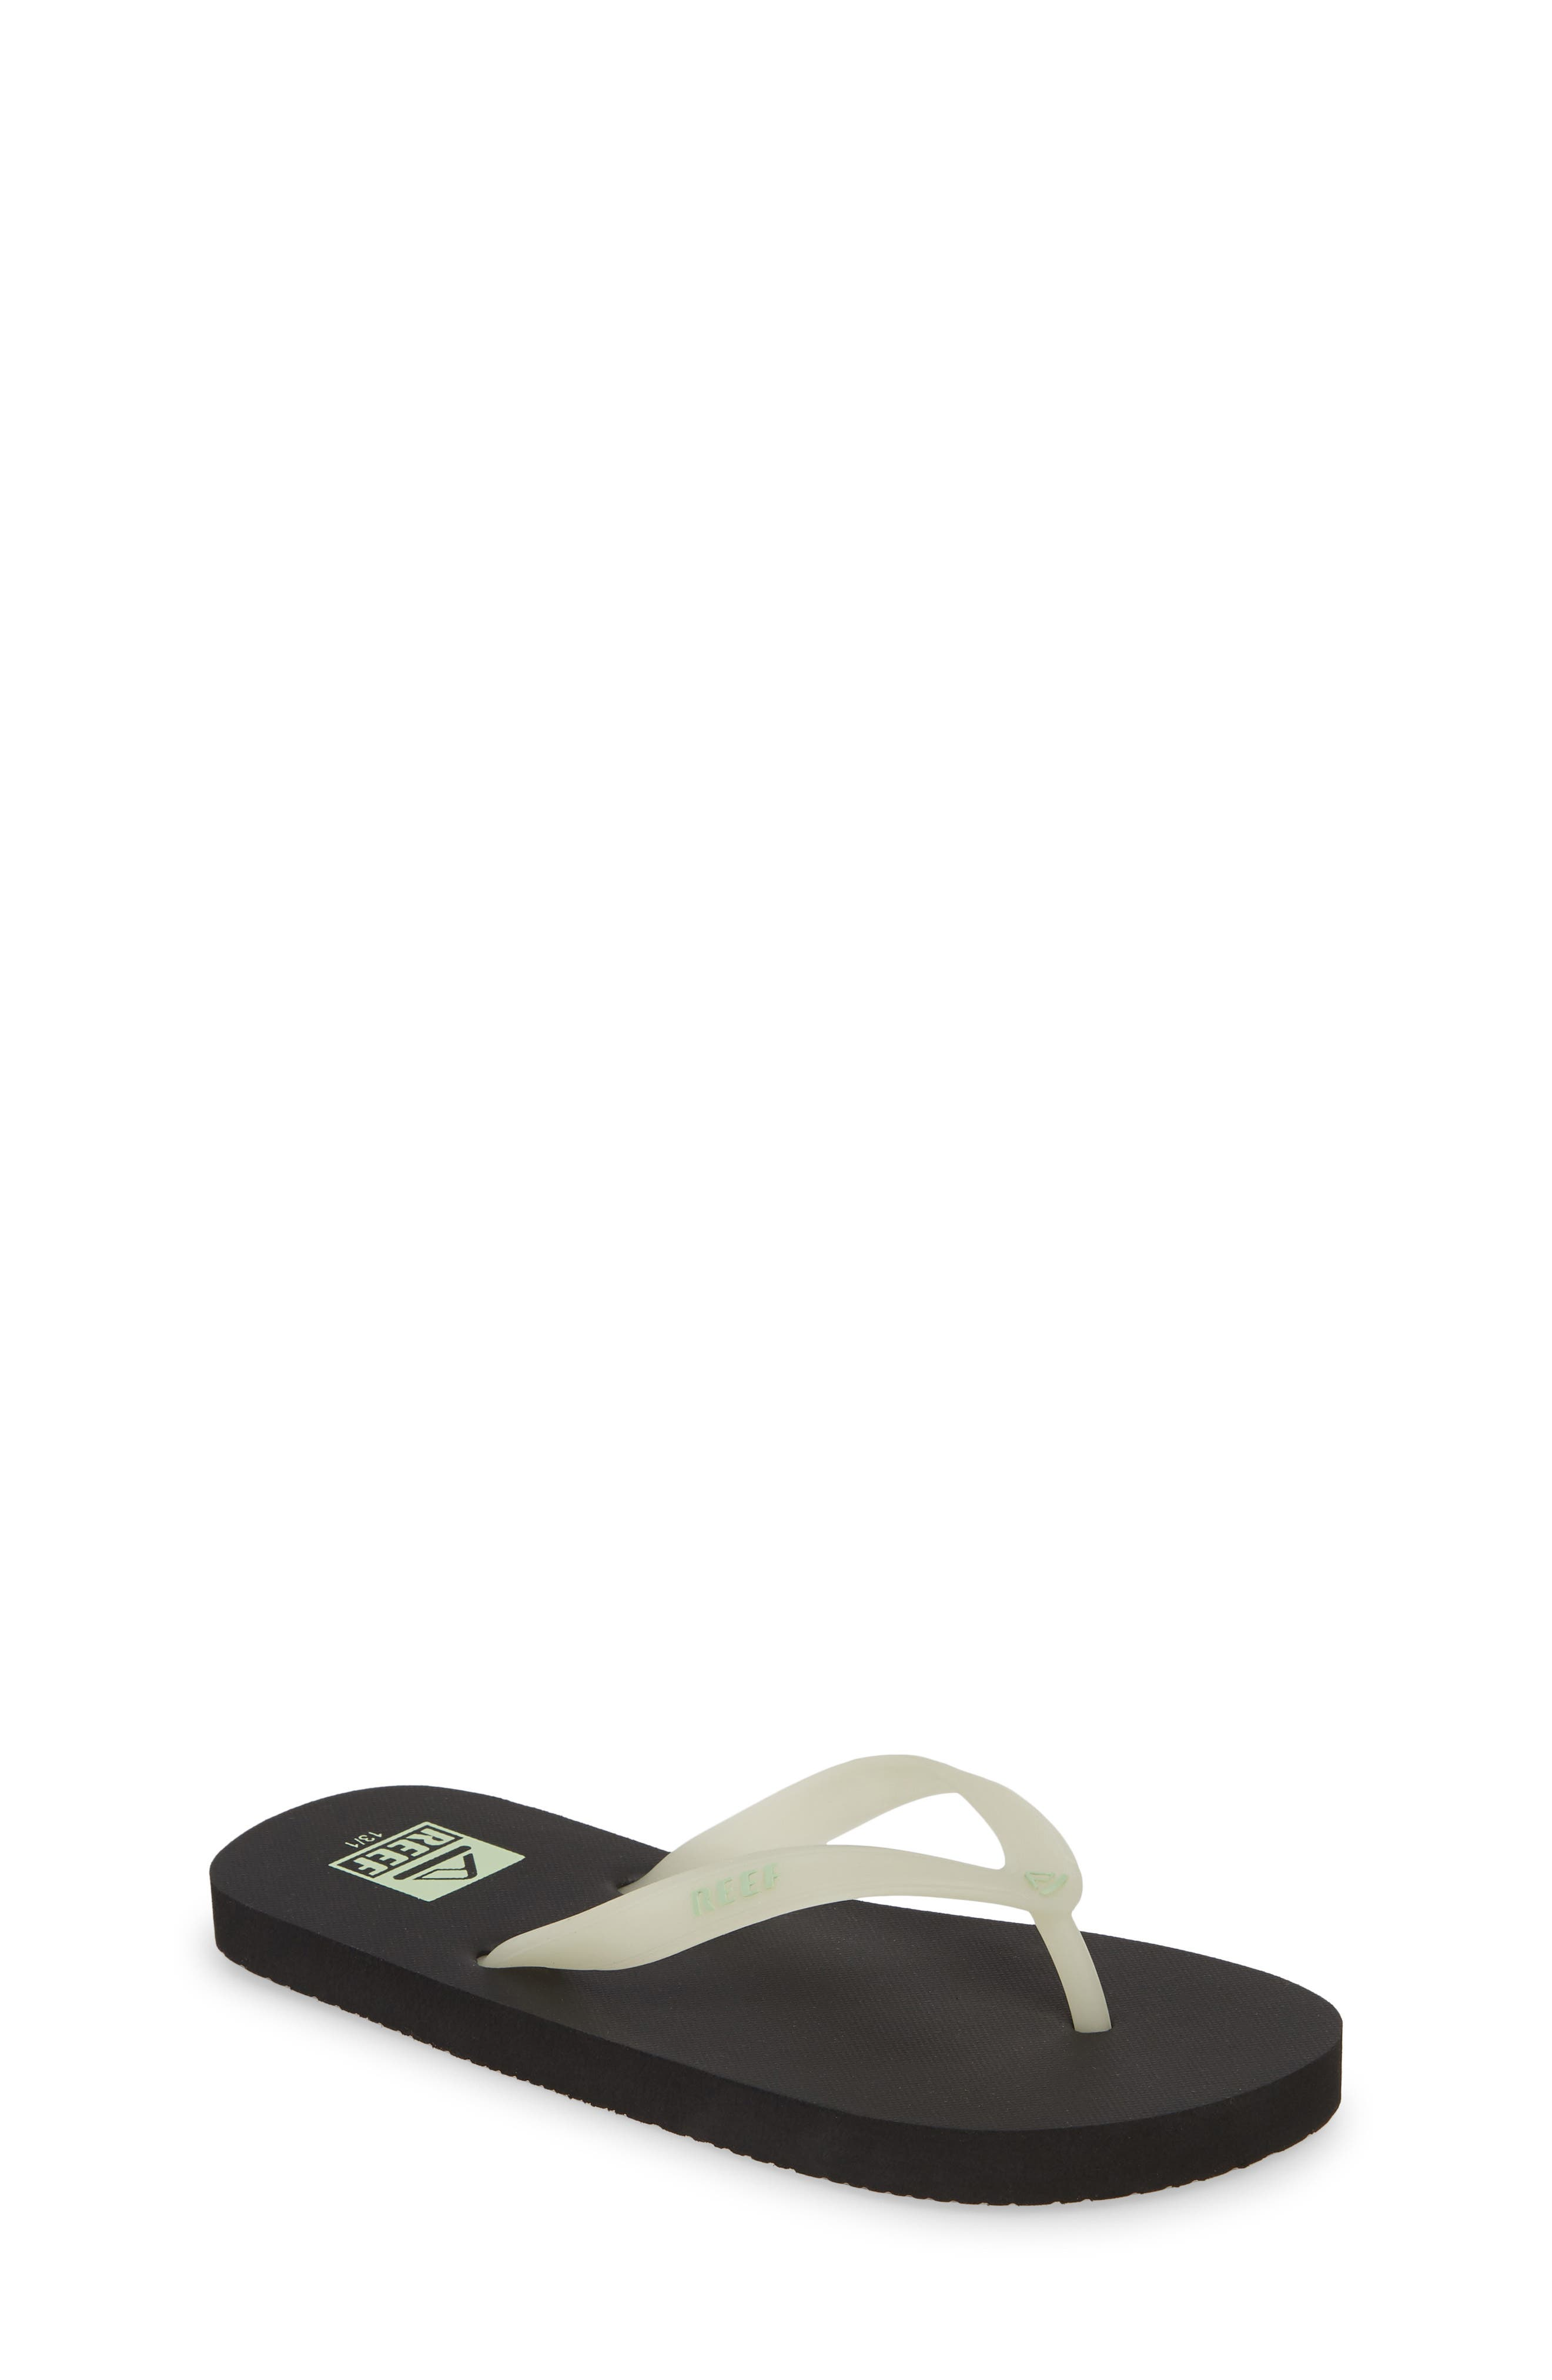 REEF Switchfoot Glow Flip Flop, Main, color, BLACK GLOW